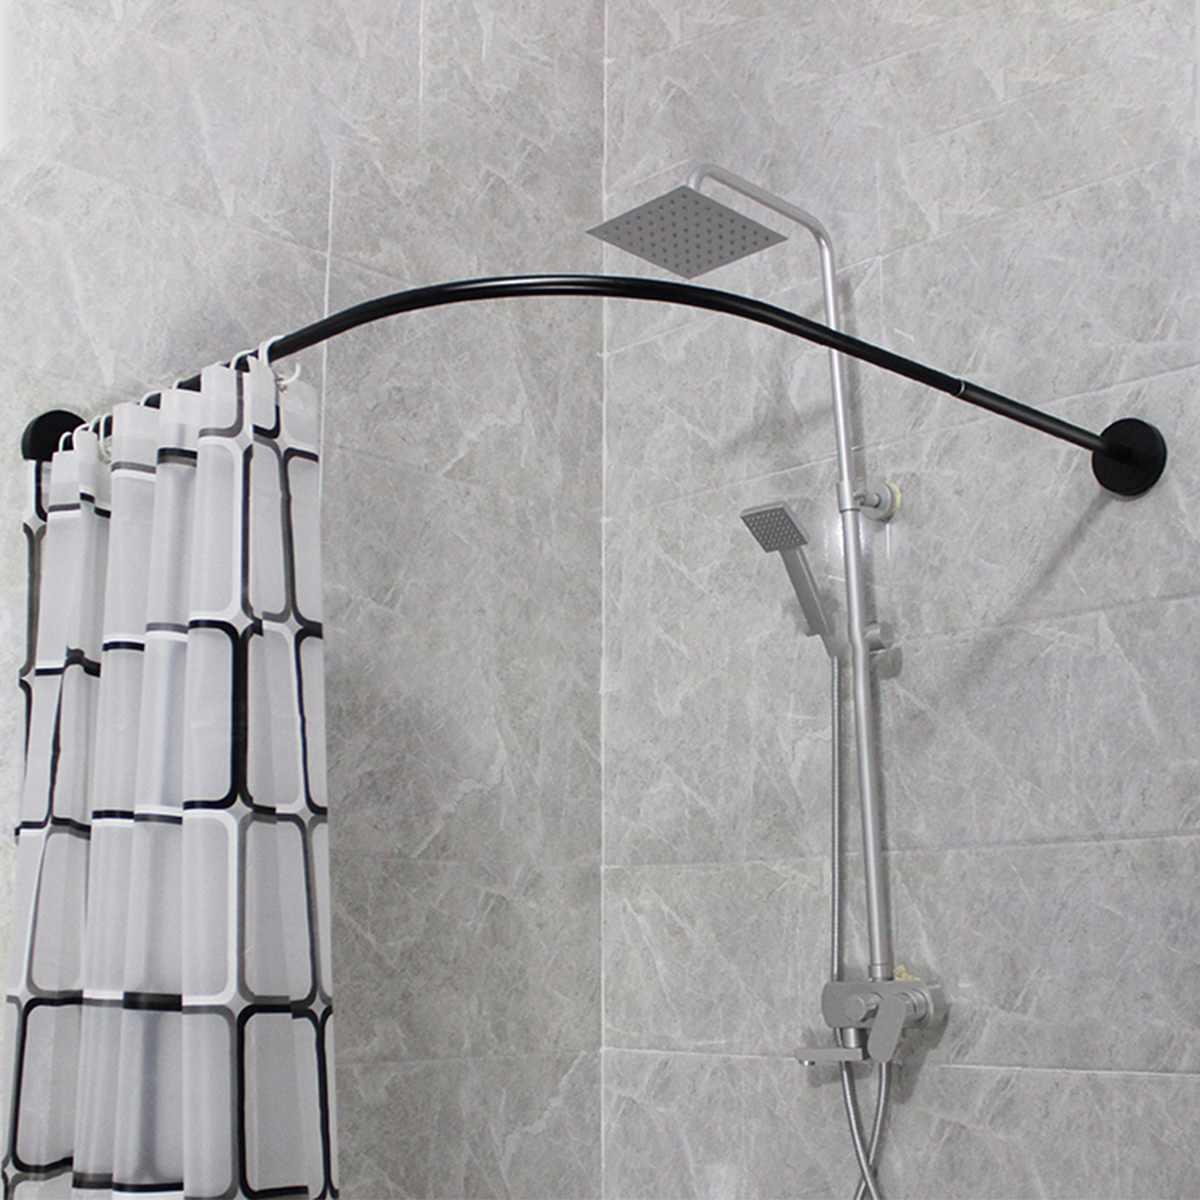 Extendable Corner Shower Curtain Rod Pole 90-130cm Stainless Steel Rail Rod Bar High Quality Bath Door Hardware Heavy Loaded